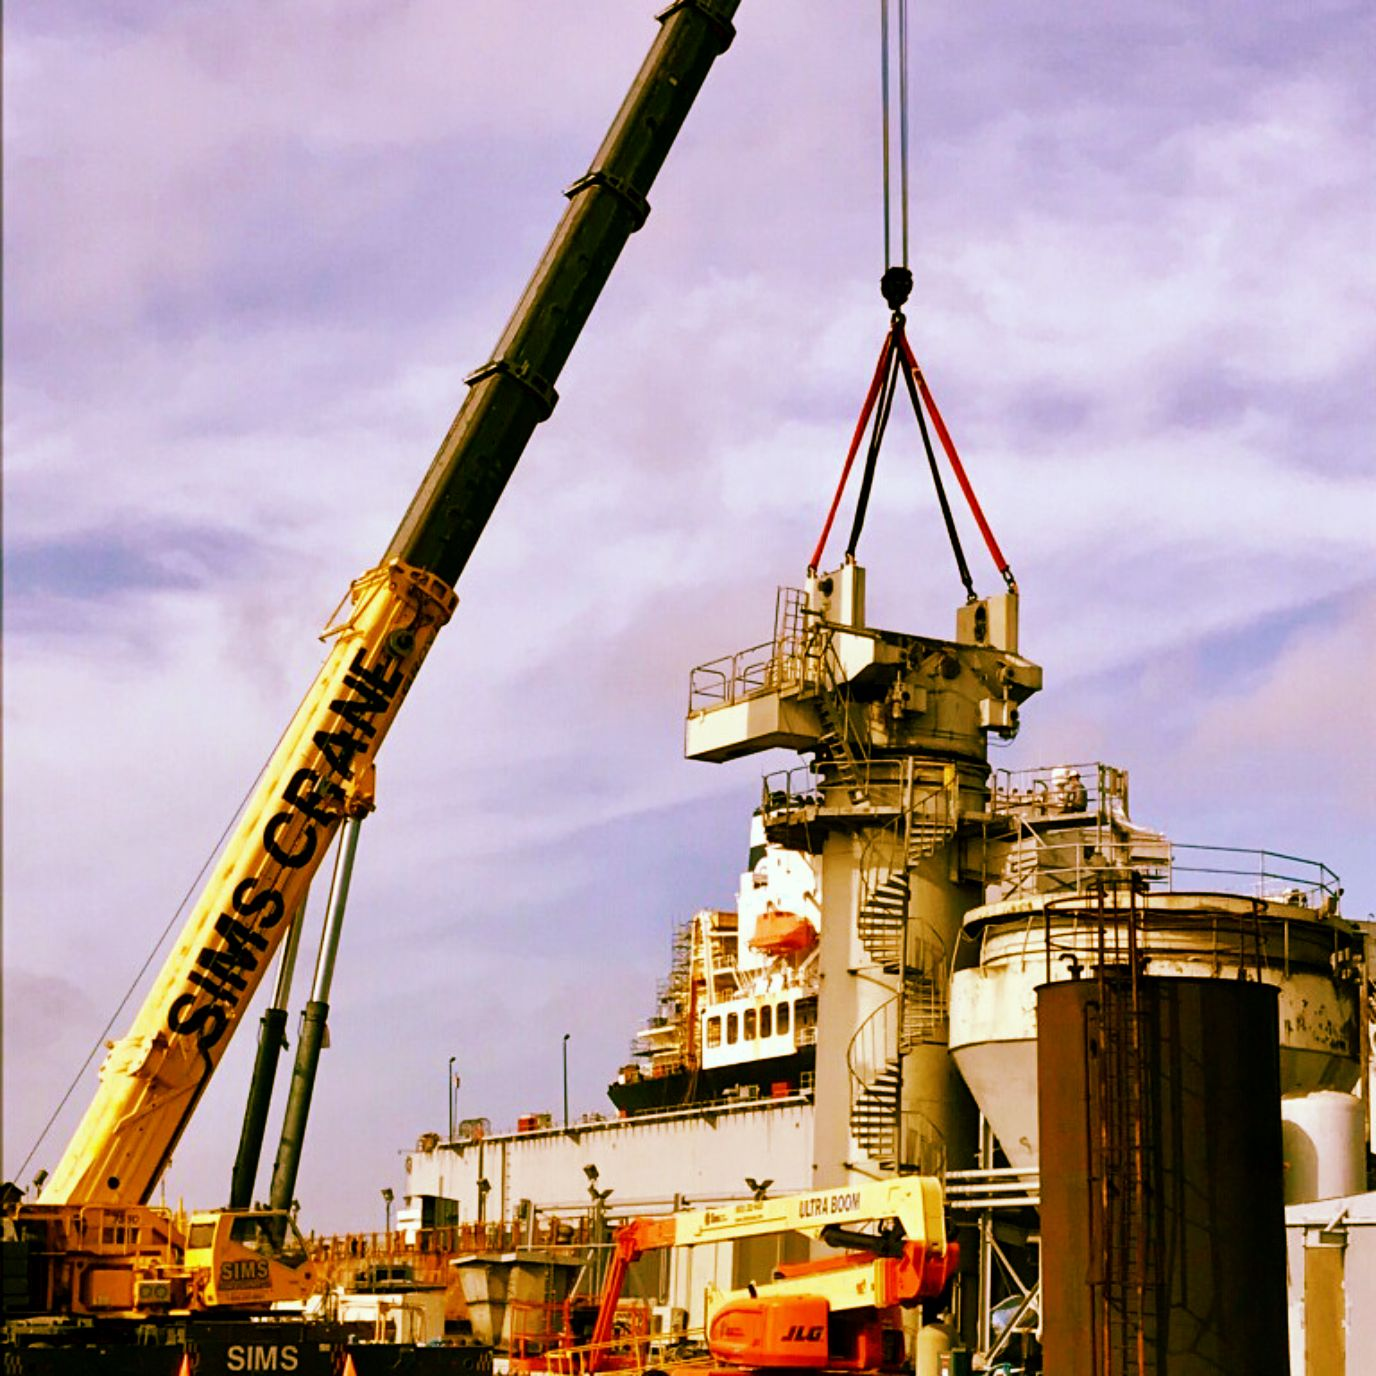 Sims Crane & Equipment Co. image 0